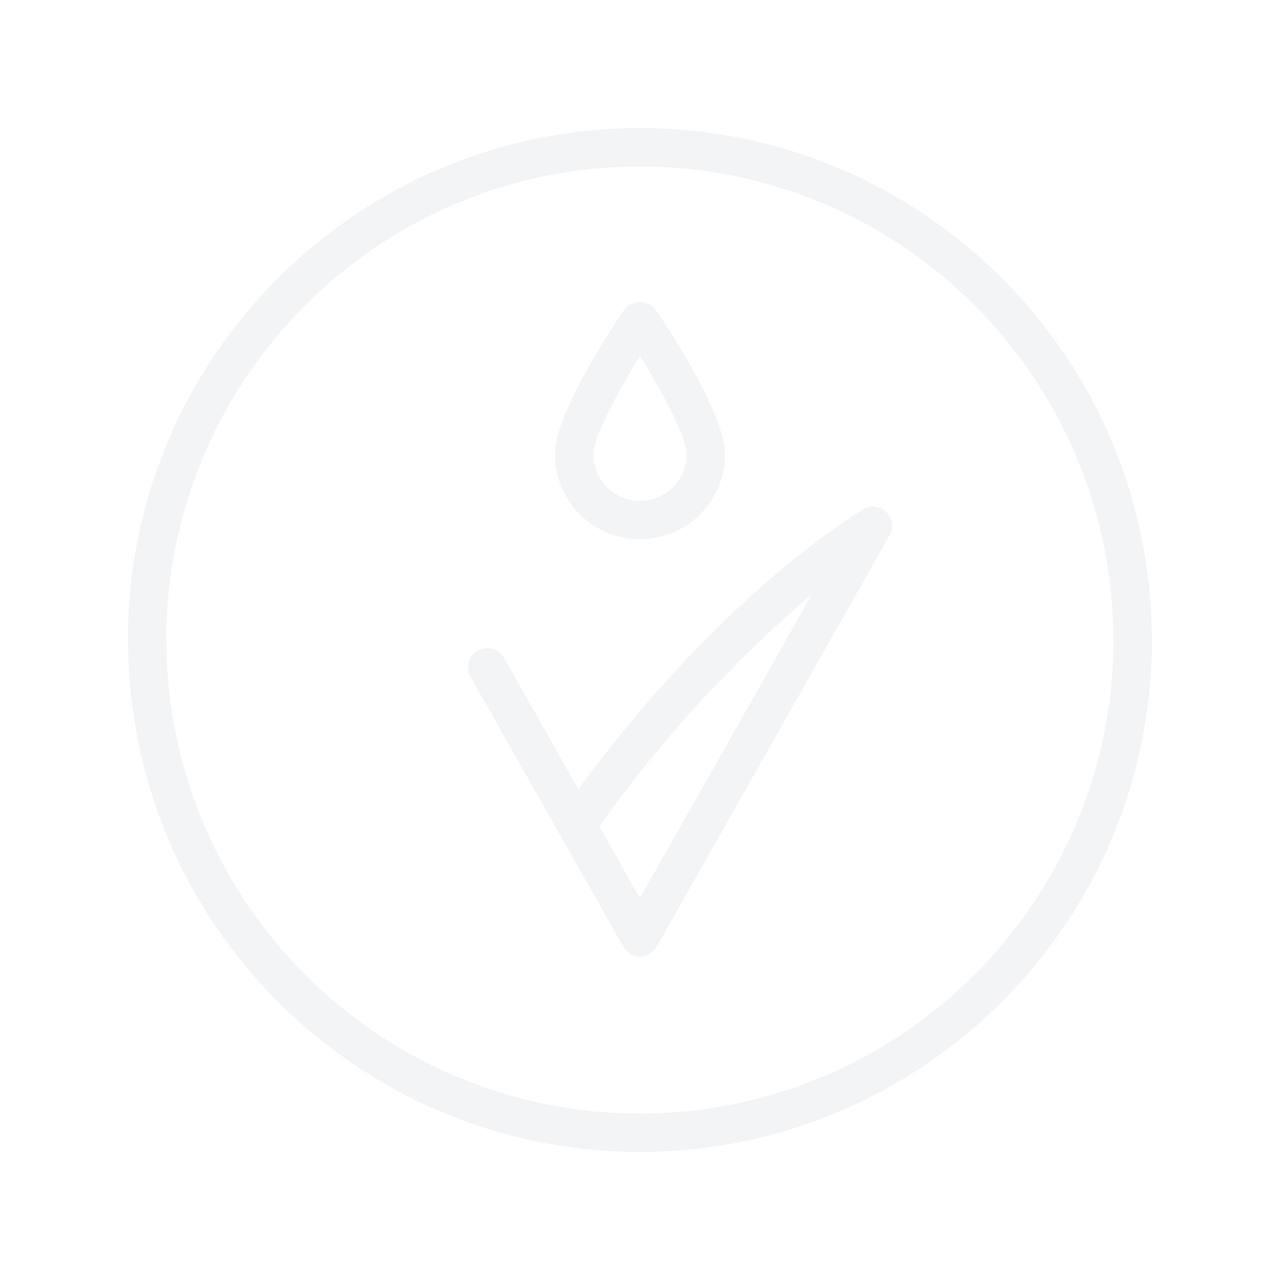 MIZON Joyful Time Essence Bamboo Mask 23g тканевая маска с экстрактом бамбука